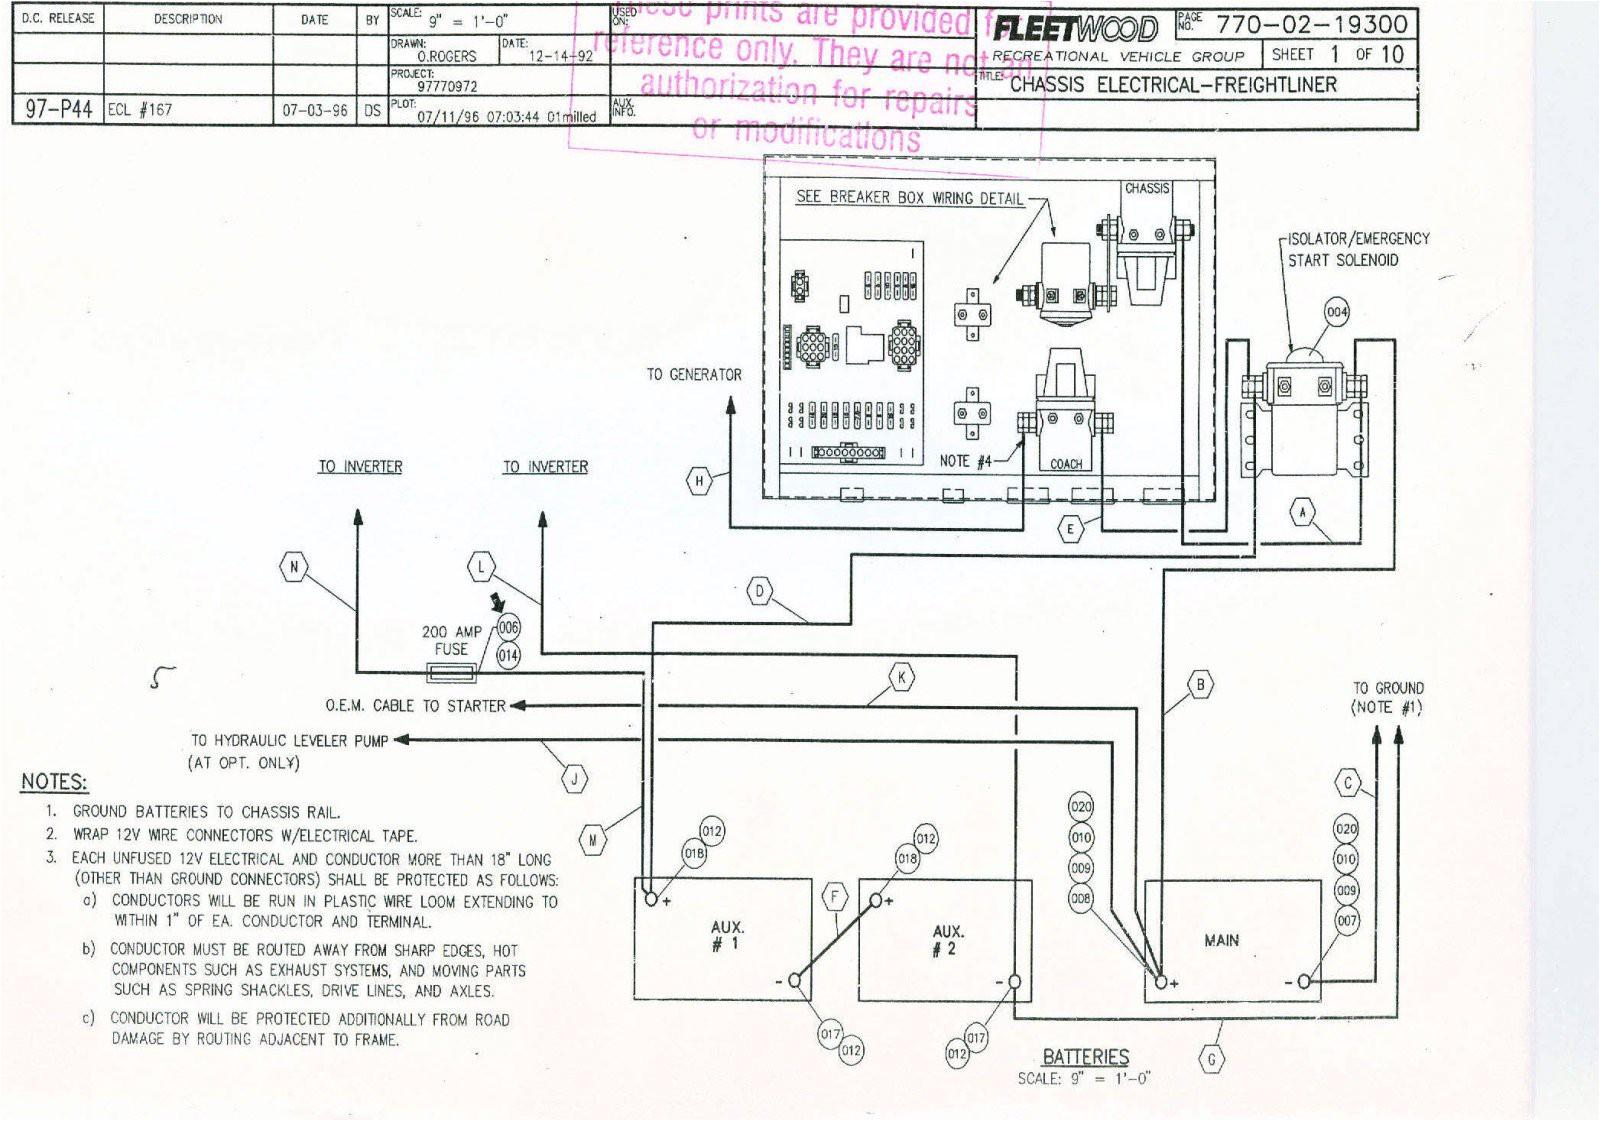 2000 fleetwood storm wiring diagram wiring diagram list fleetwood storm rv wiring diagrams